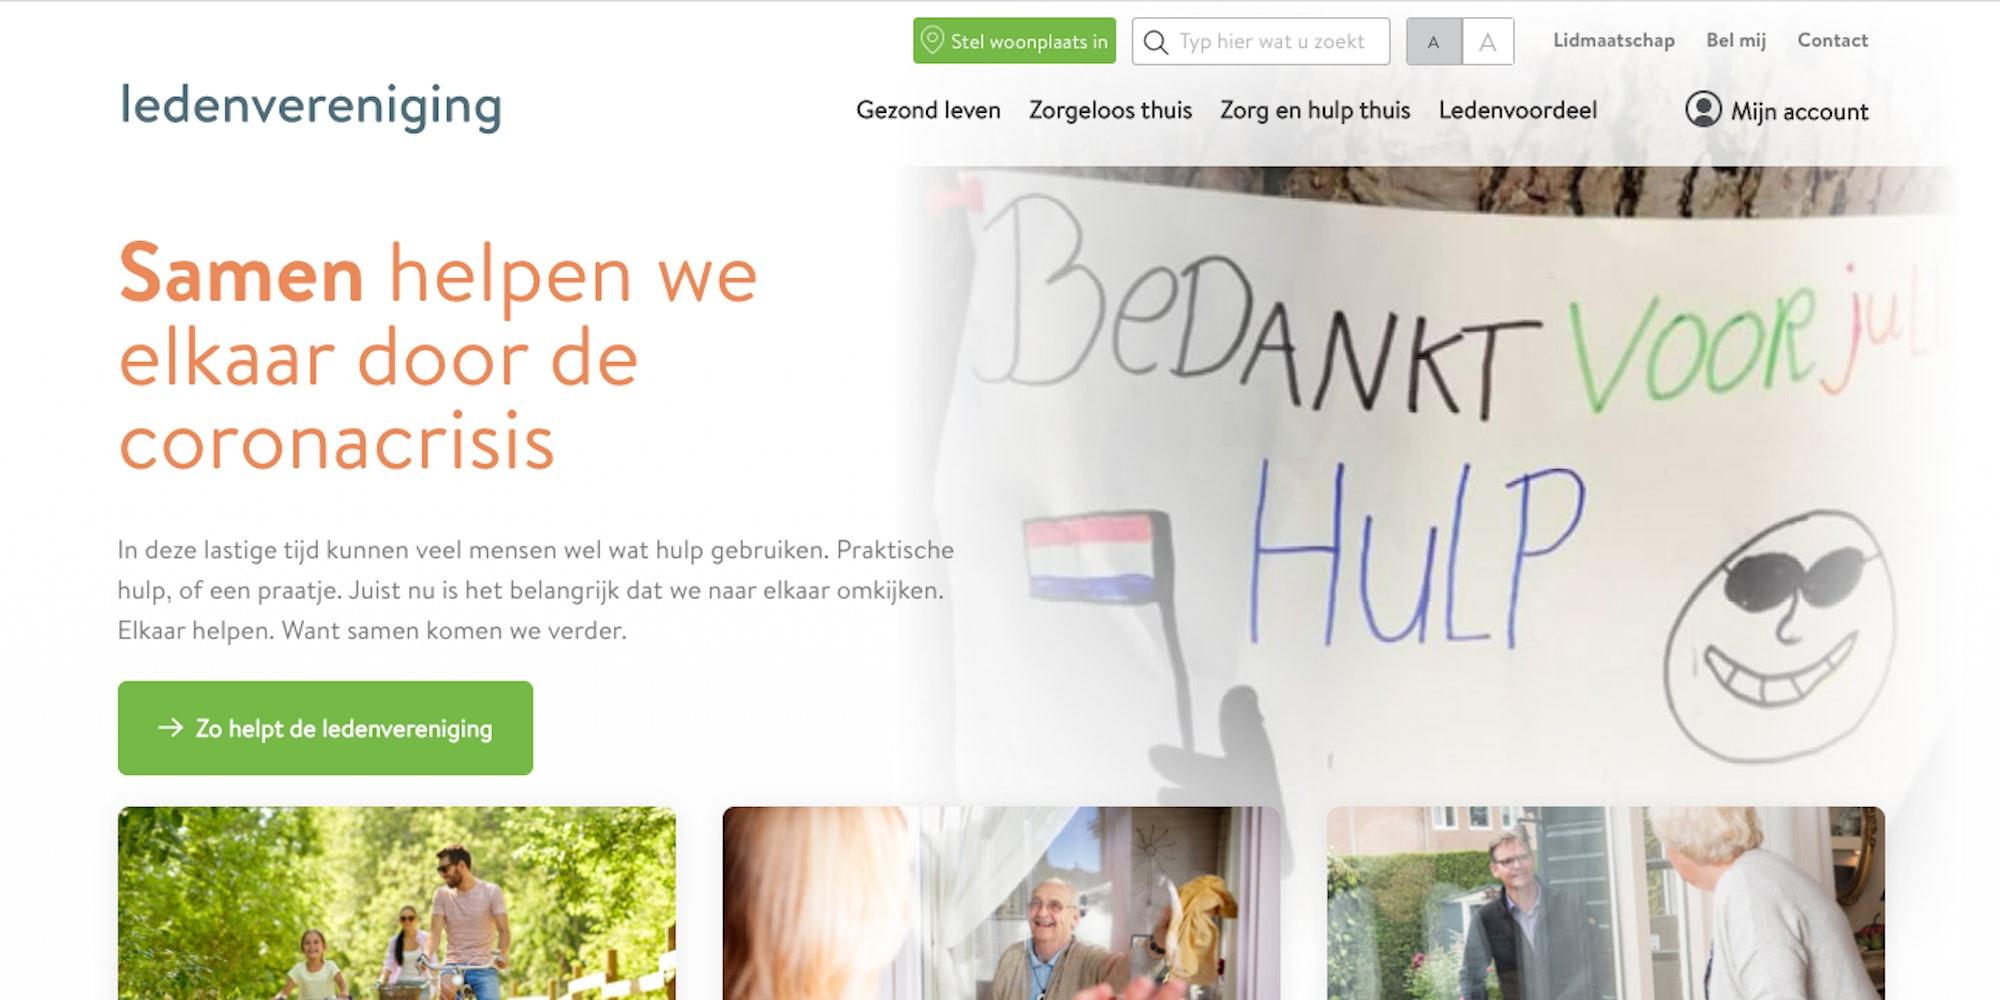 Ledenvereniging homepage screenshot